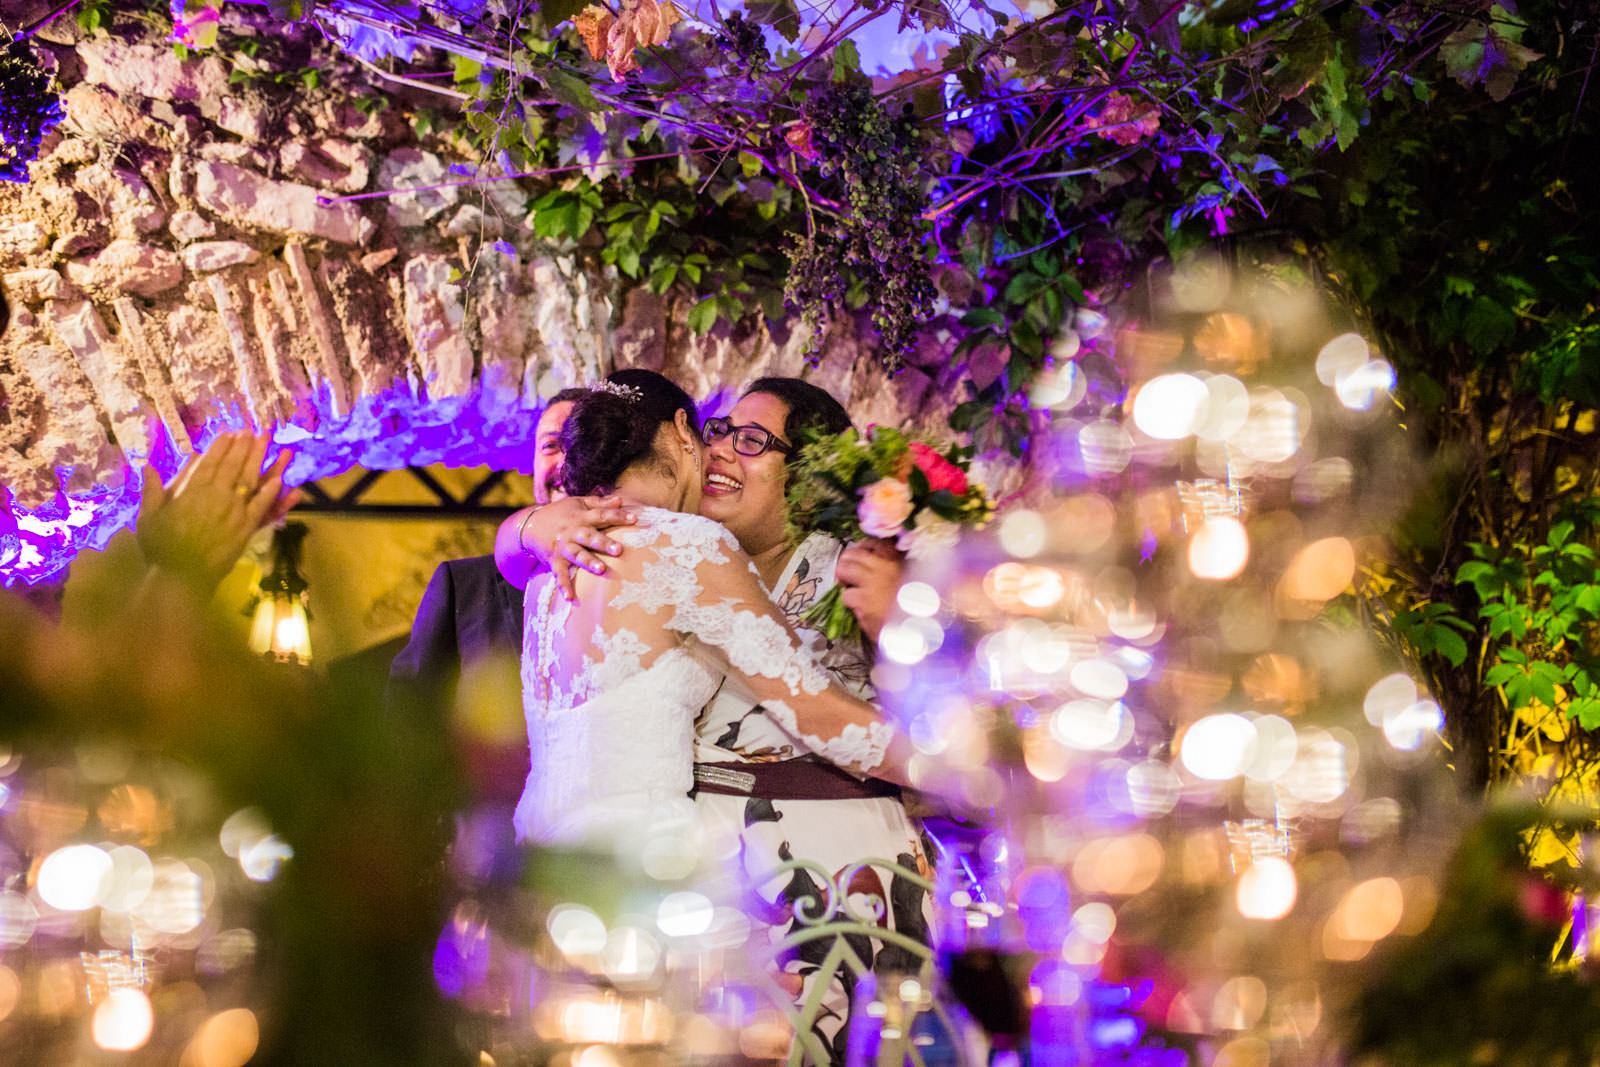 Almirall-Font-sitges-marbella-engagement-Rafael-Torres-fotografo-bodas-sevilla-madrid-barcelona-wedding-photographer--74.jpg